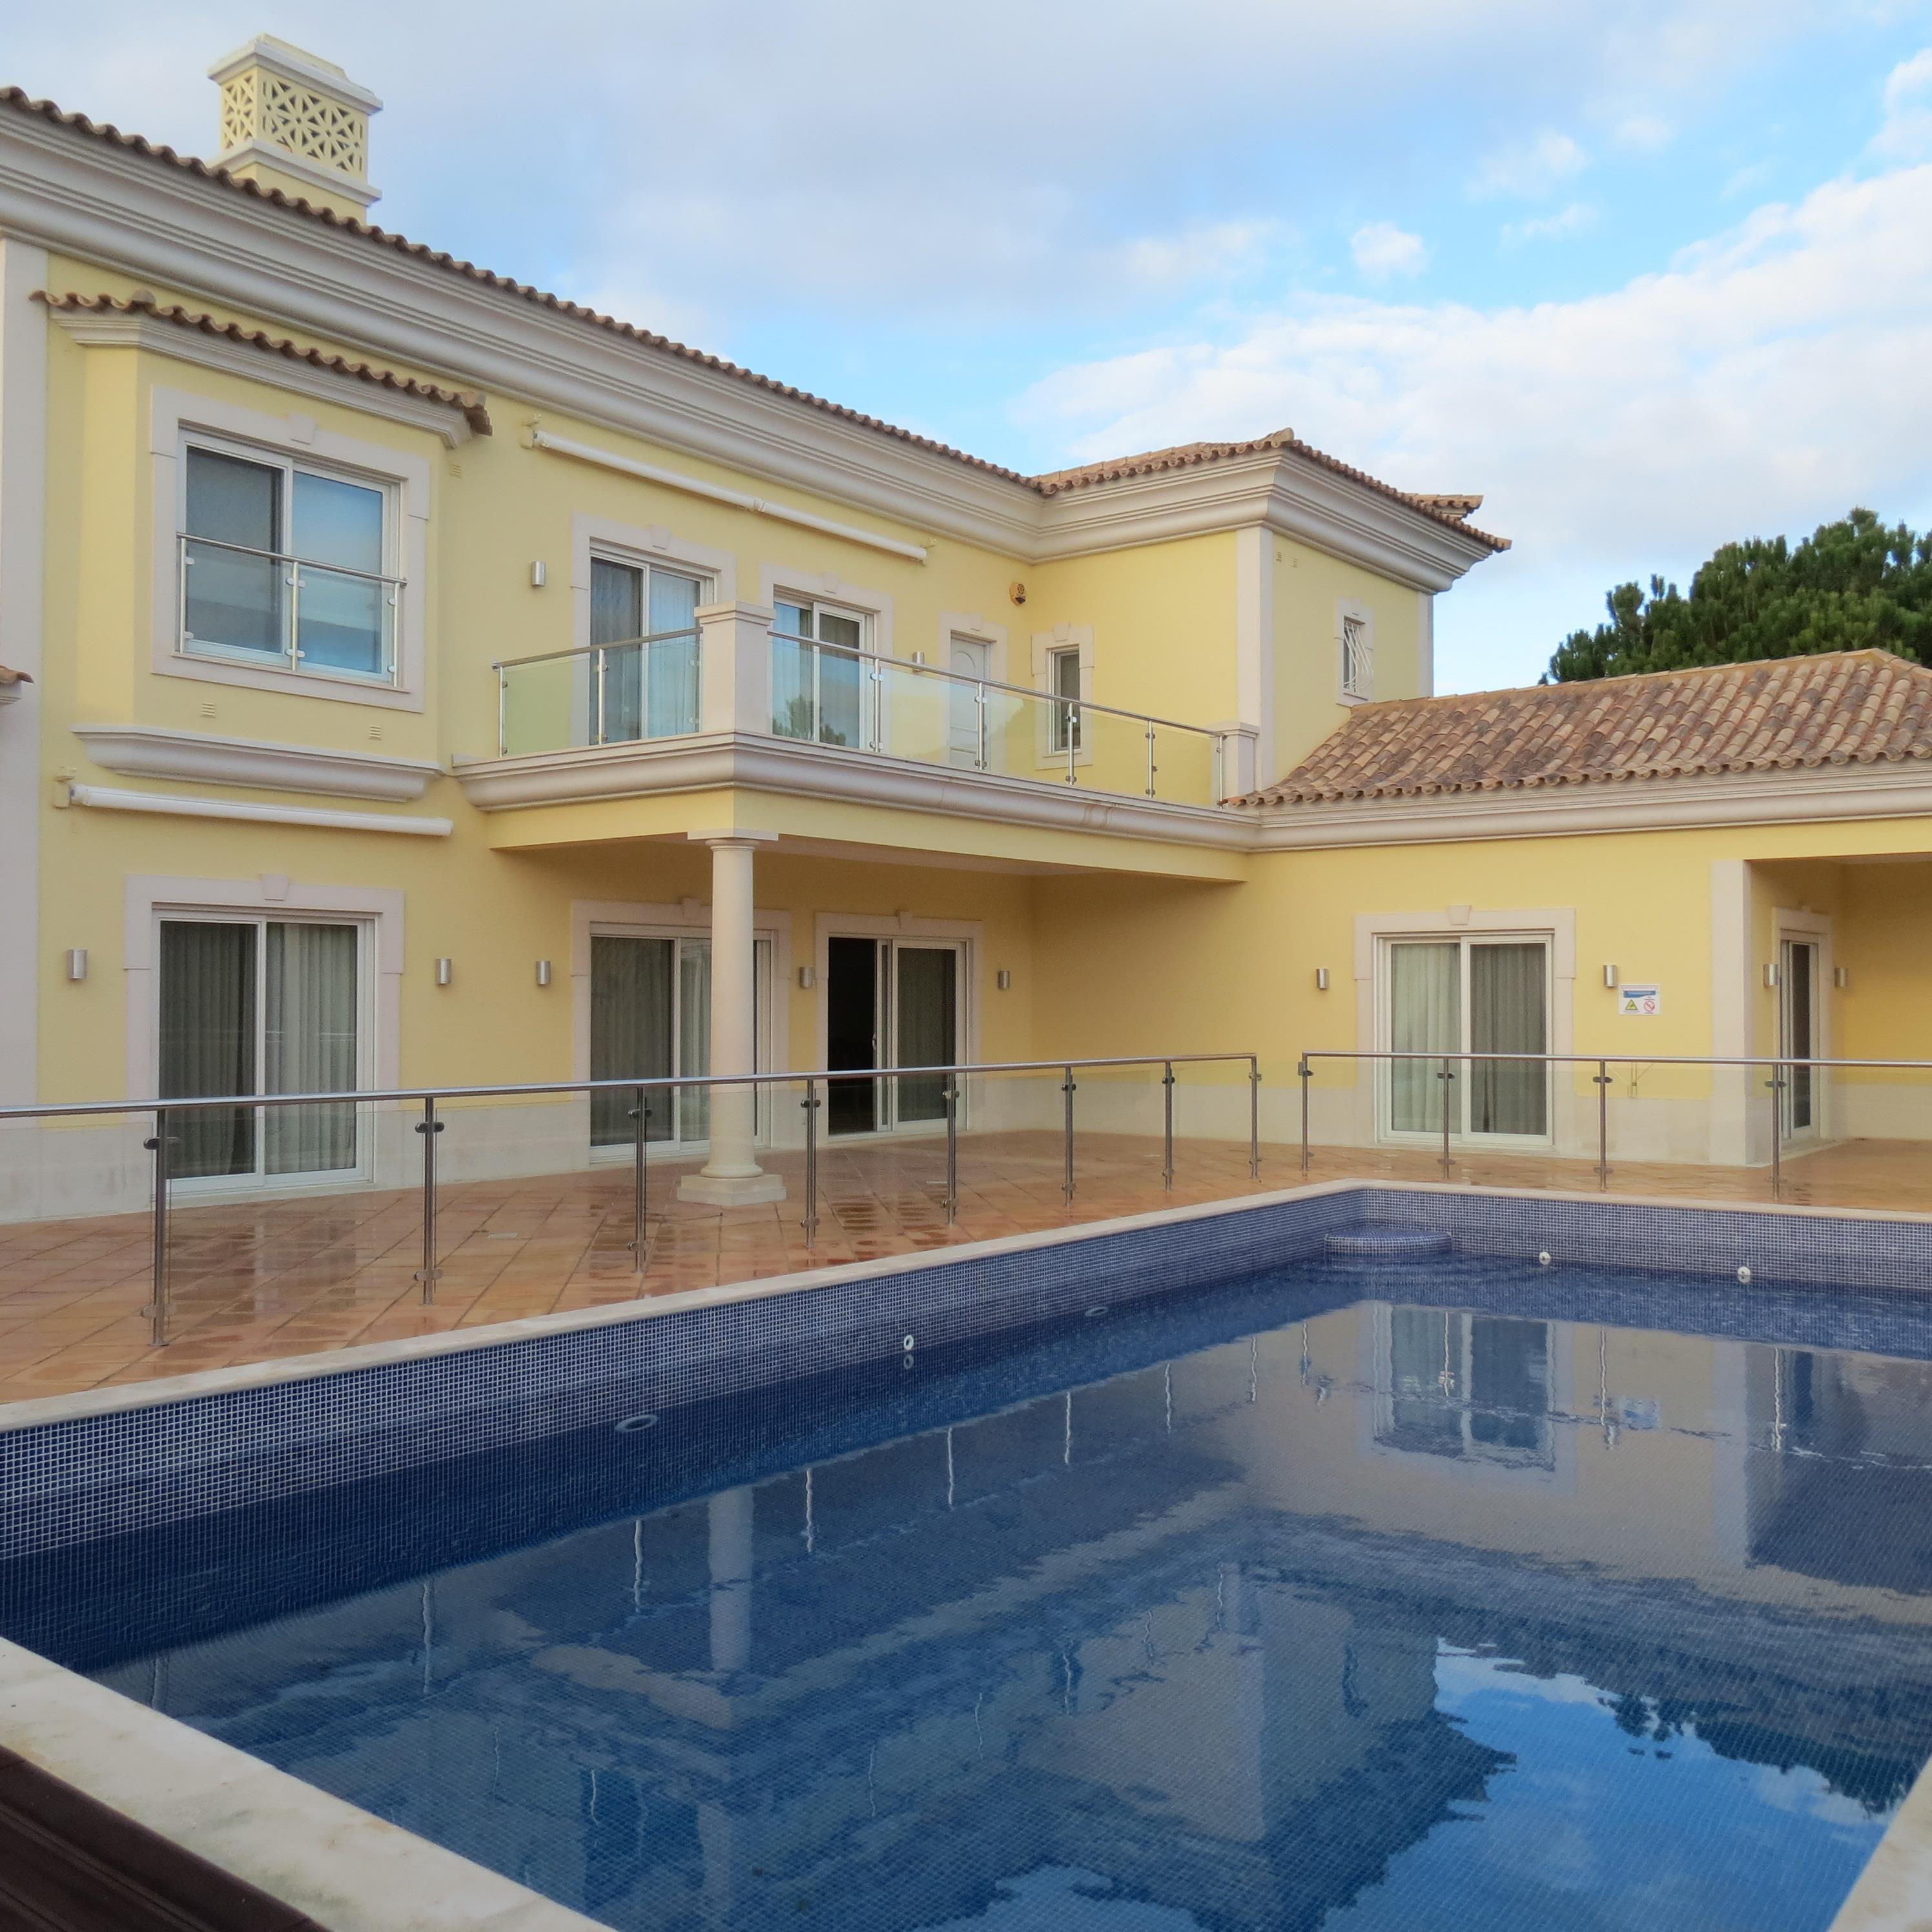 Einfamilienhaus für Verkauf beim House, 5 bedrooms, for Sale Loule, Algarve, 8135-024 Portugal